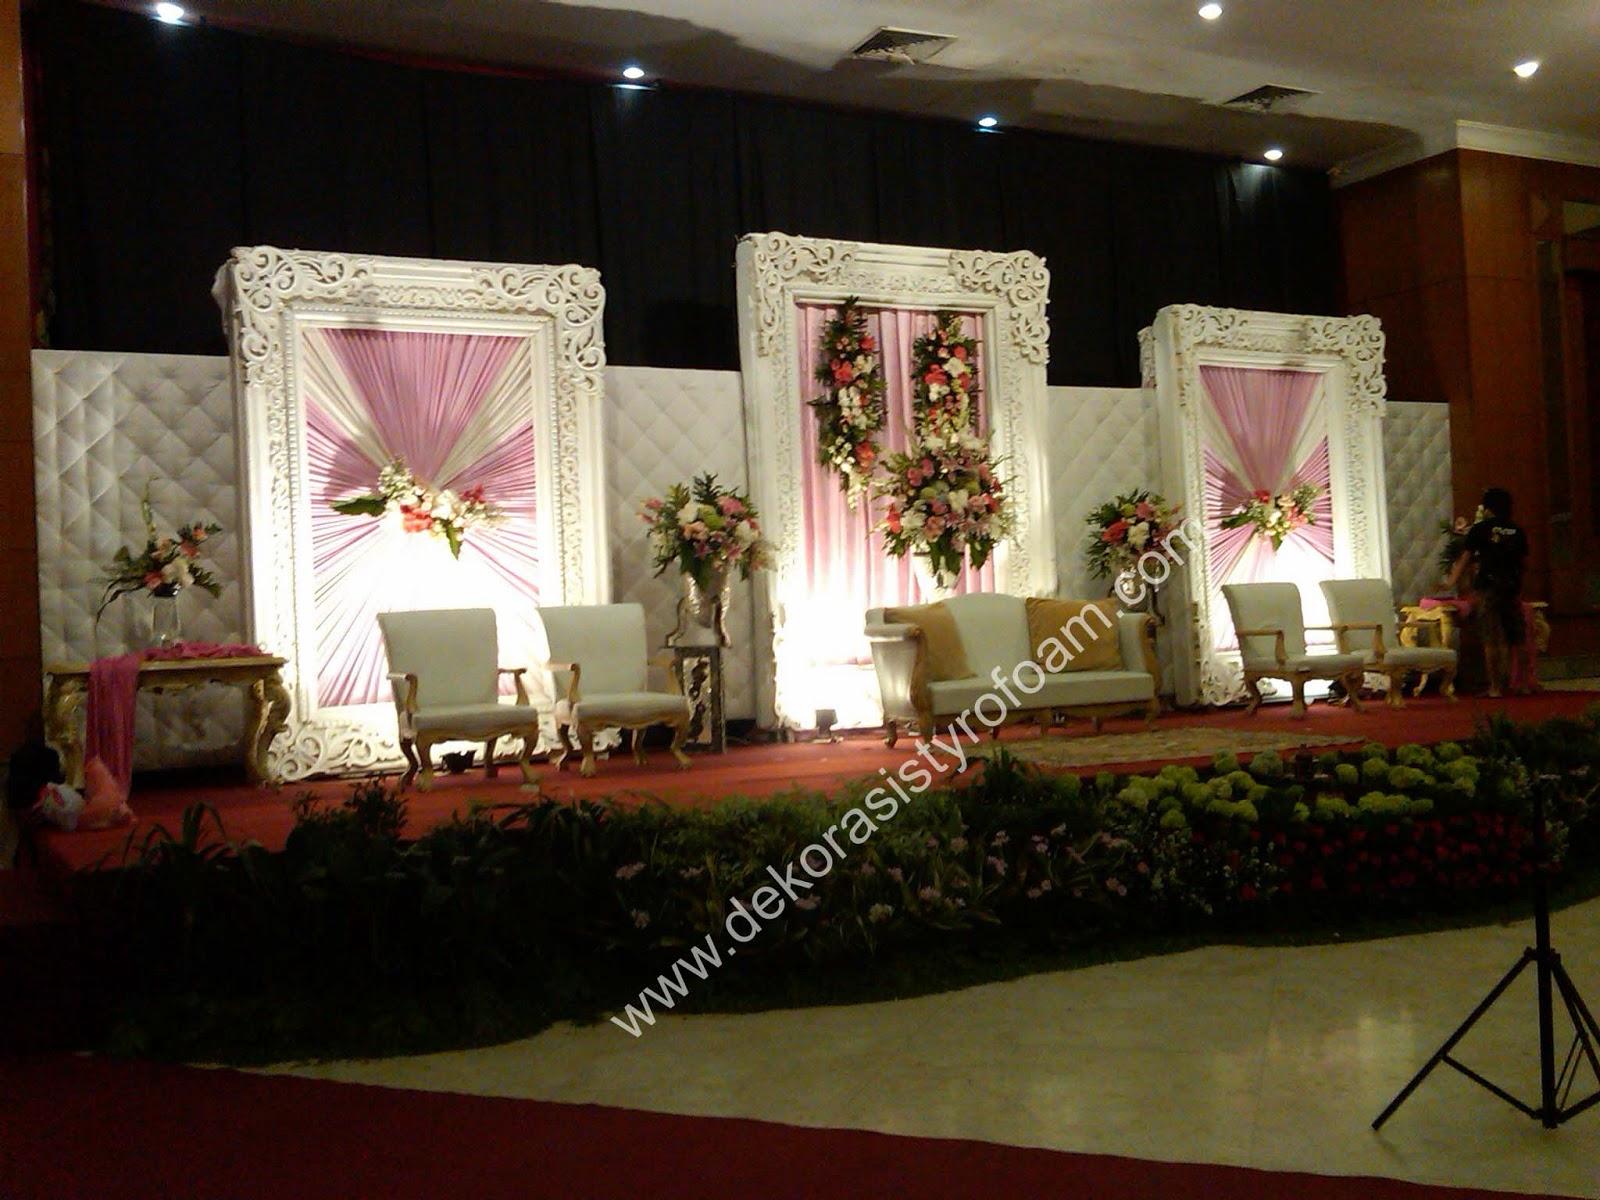 Dekorasi styrofoam dekorasi pelaminan a 4 for Dekorasi lebaran hotel